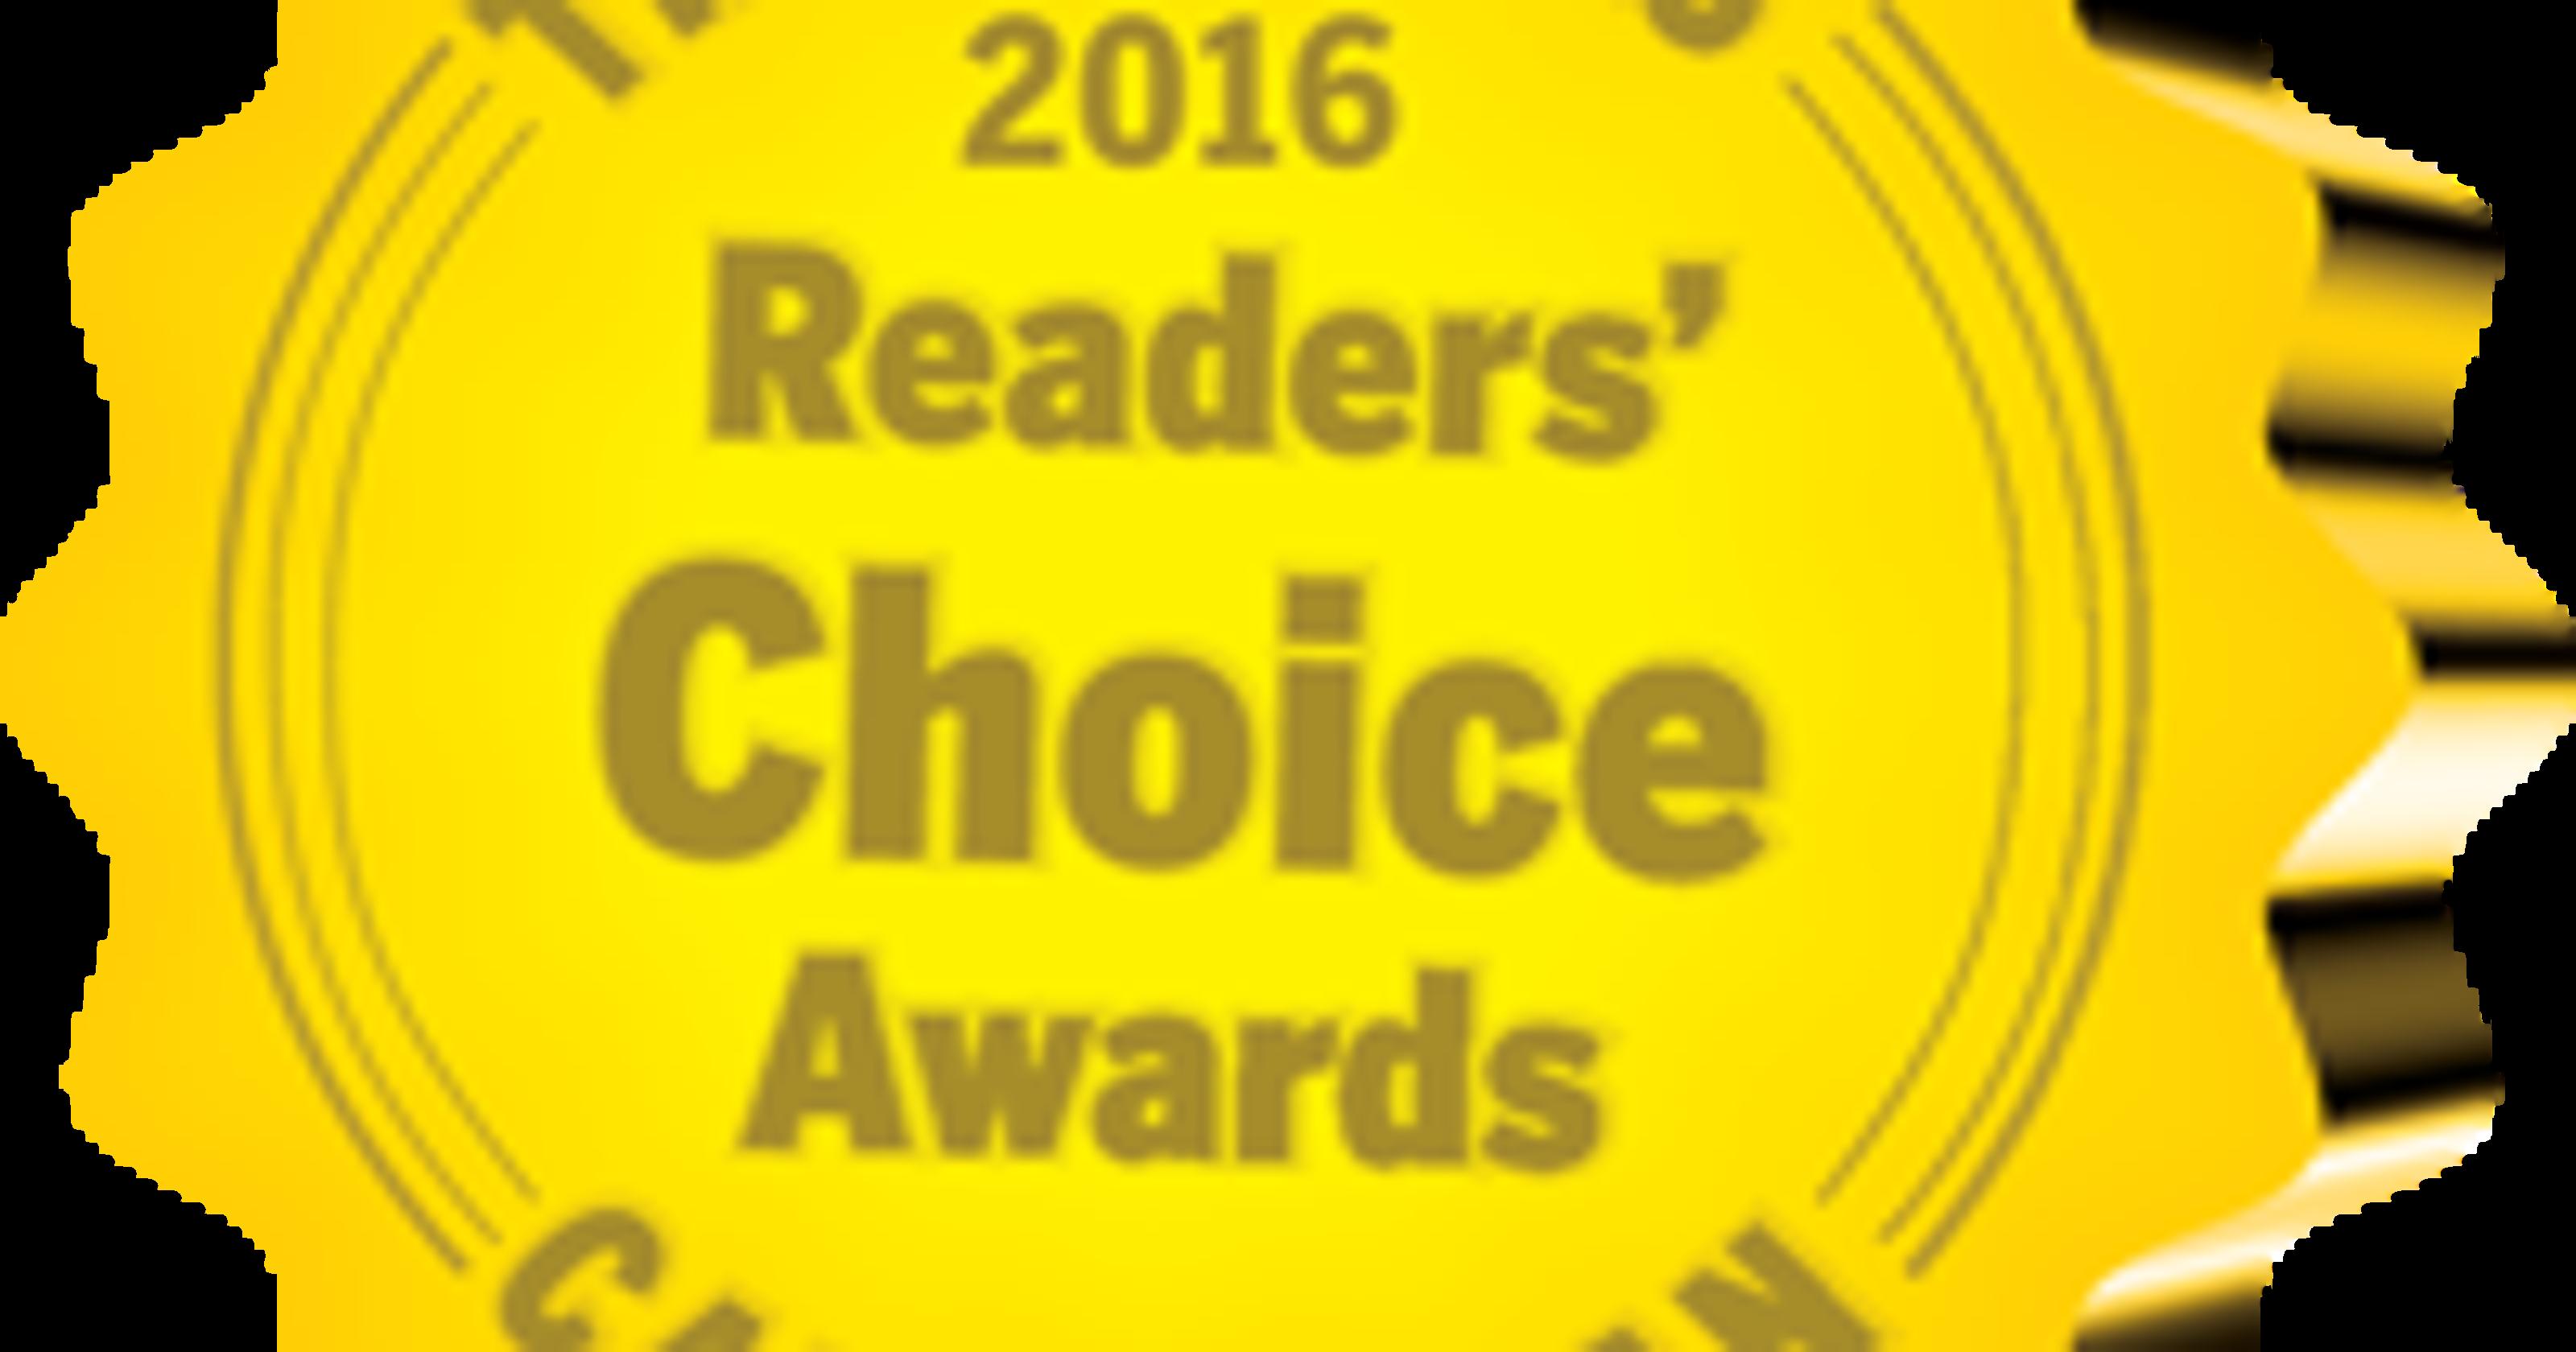 Readers\' Choice Winners announced